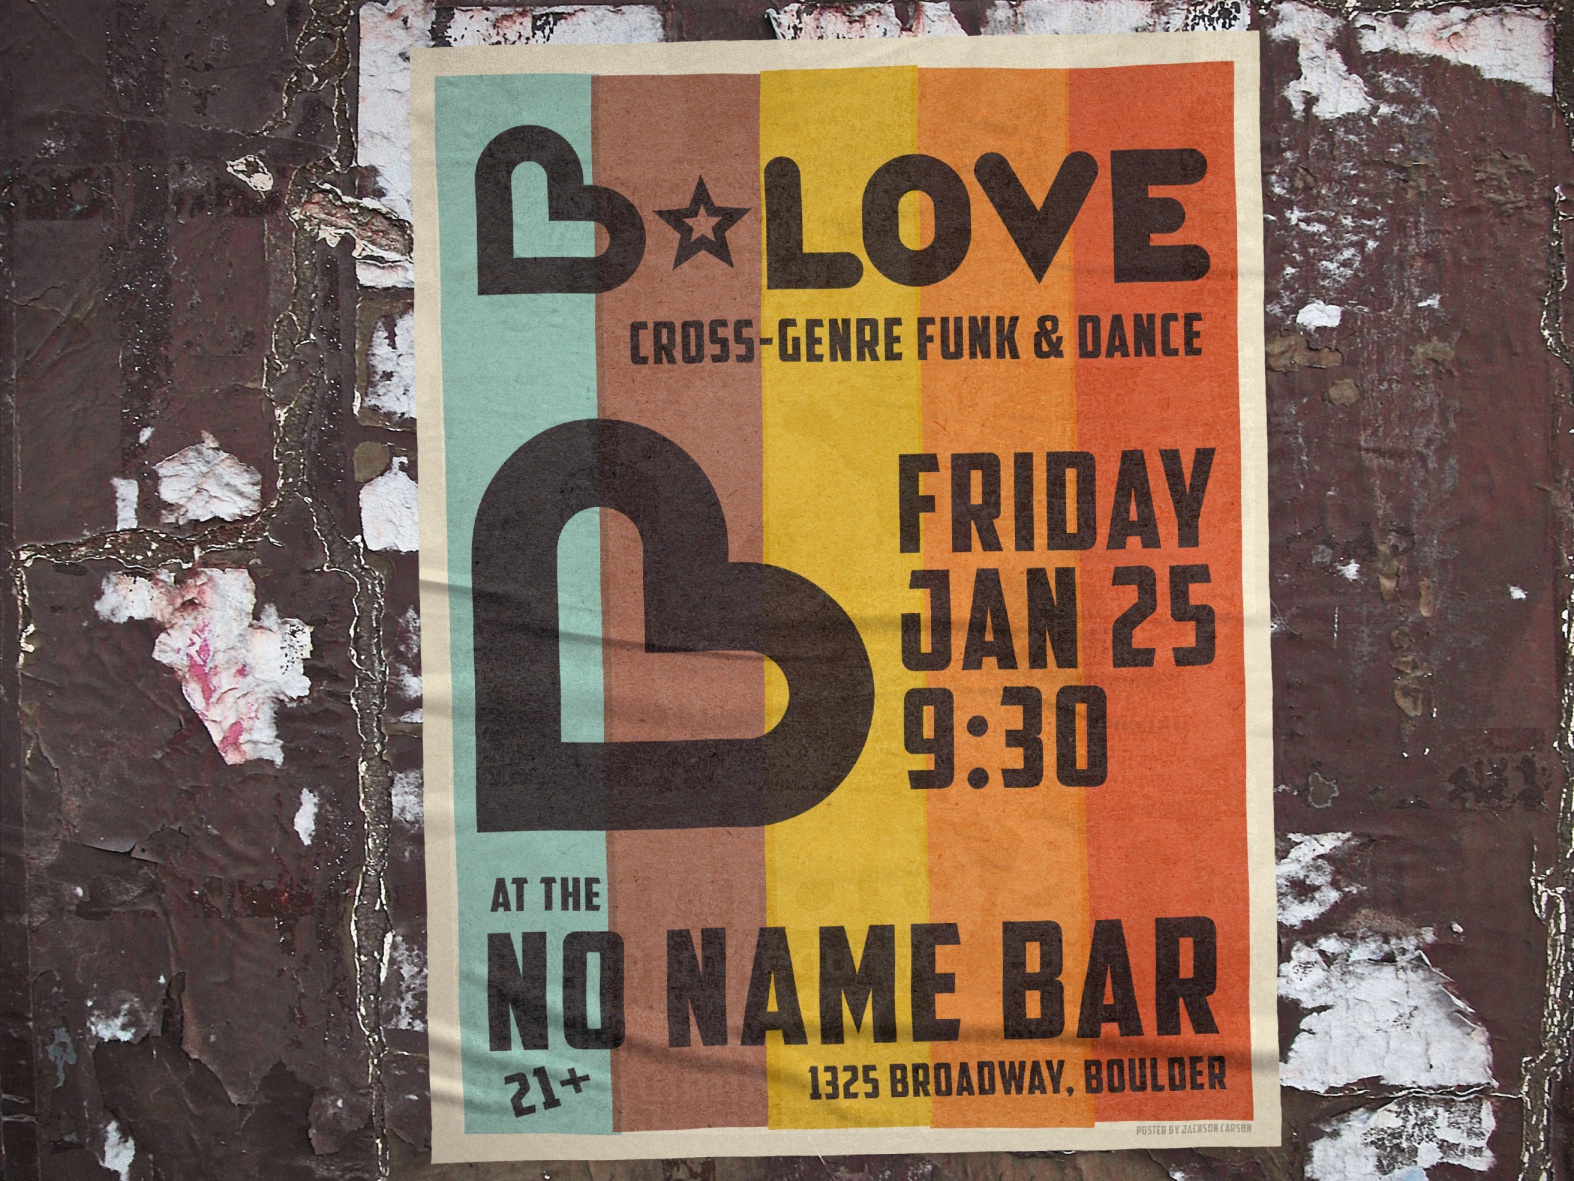 B love poster mockup 01